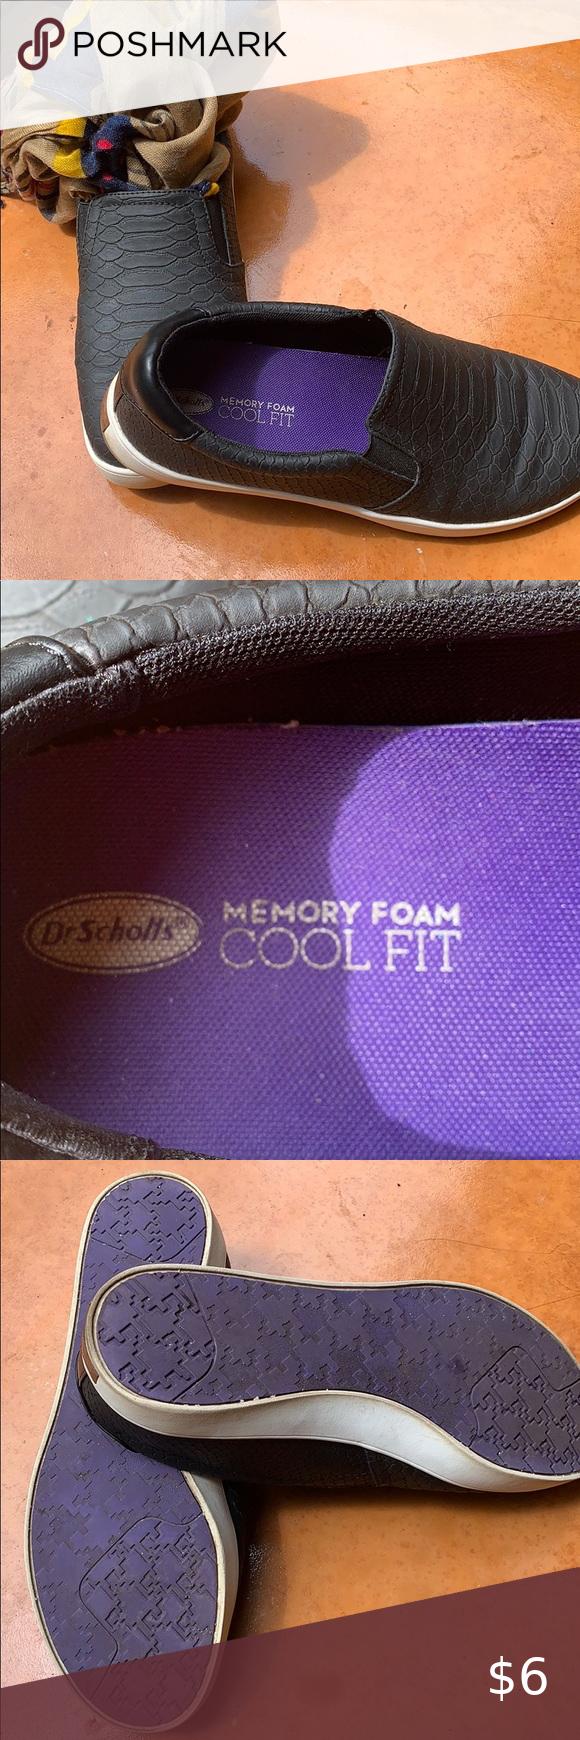 Dr Scholls | Memory Foam Cool Fit